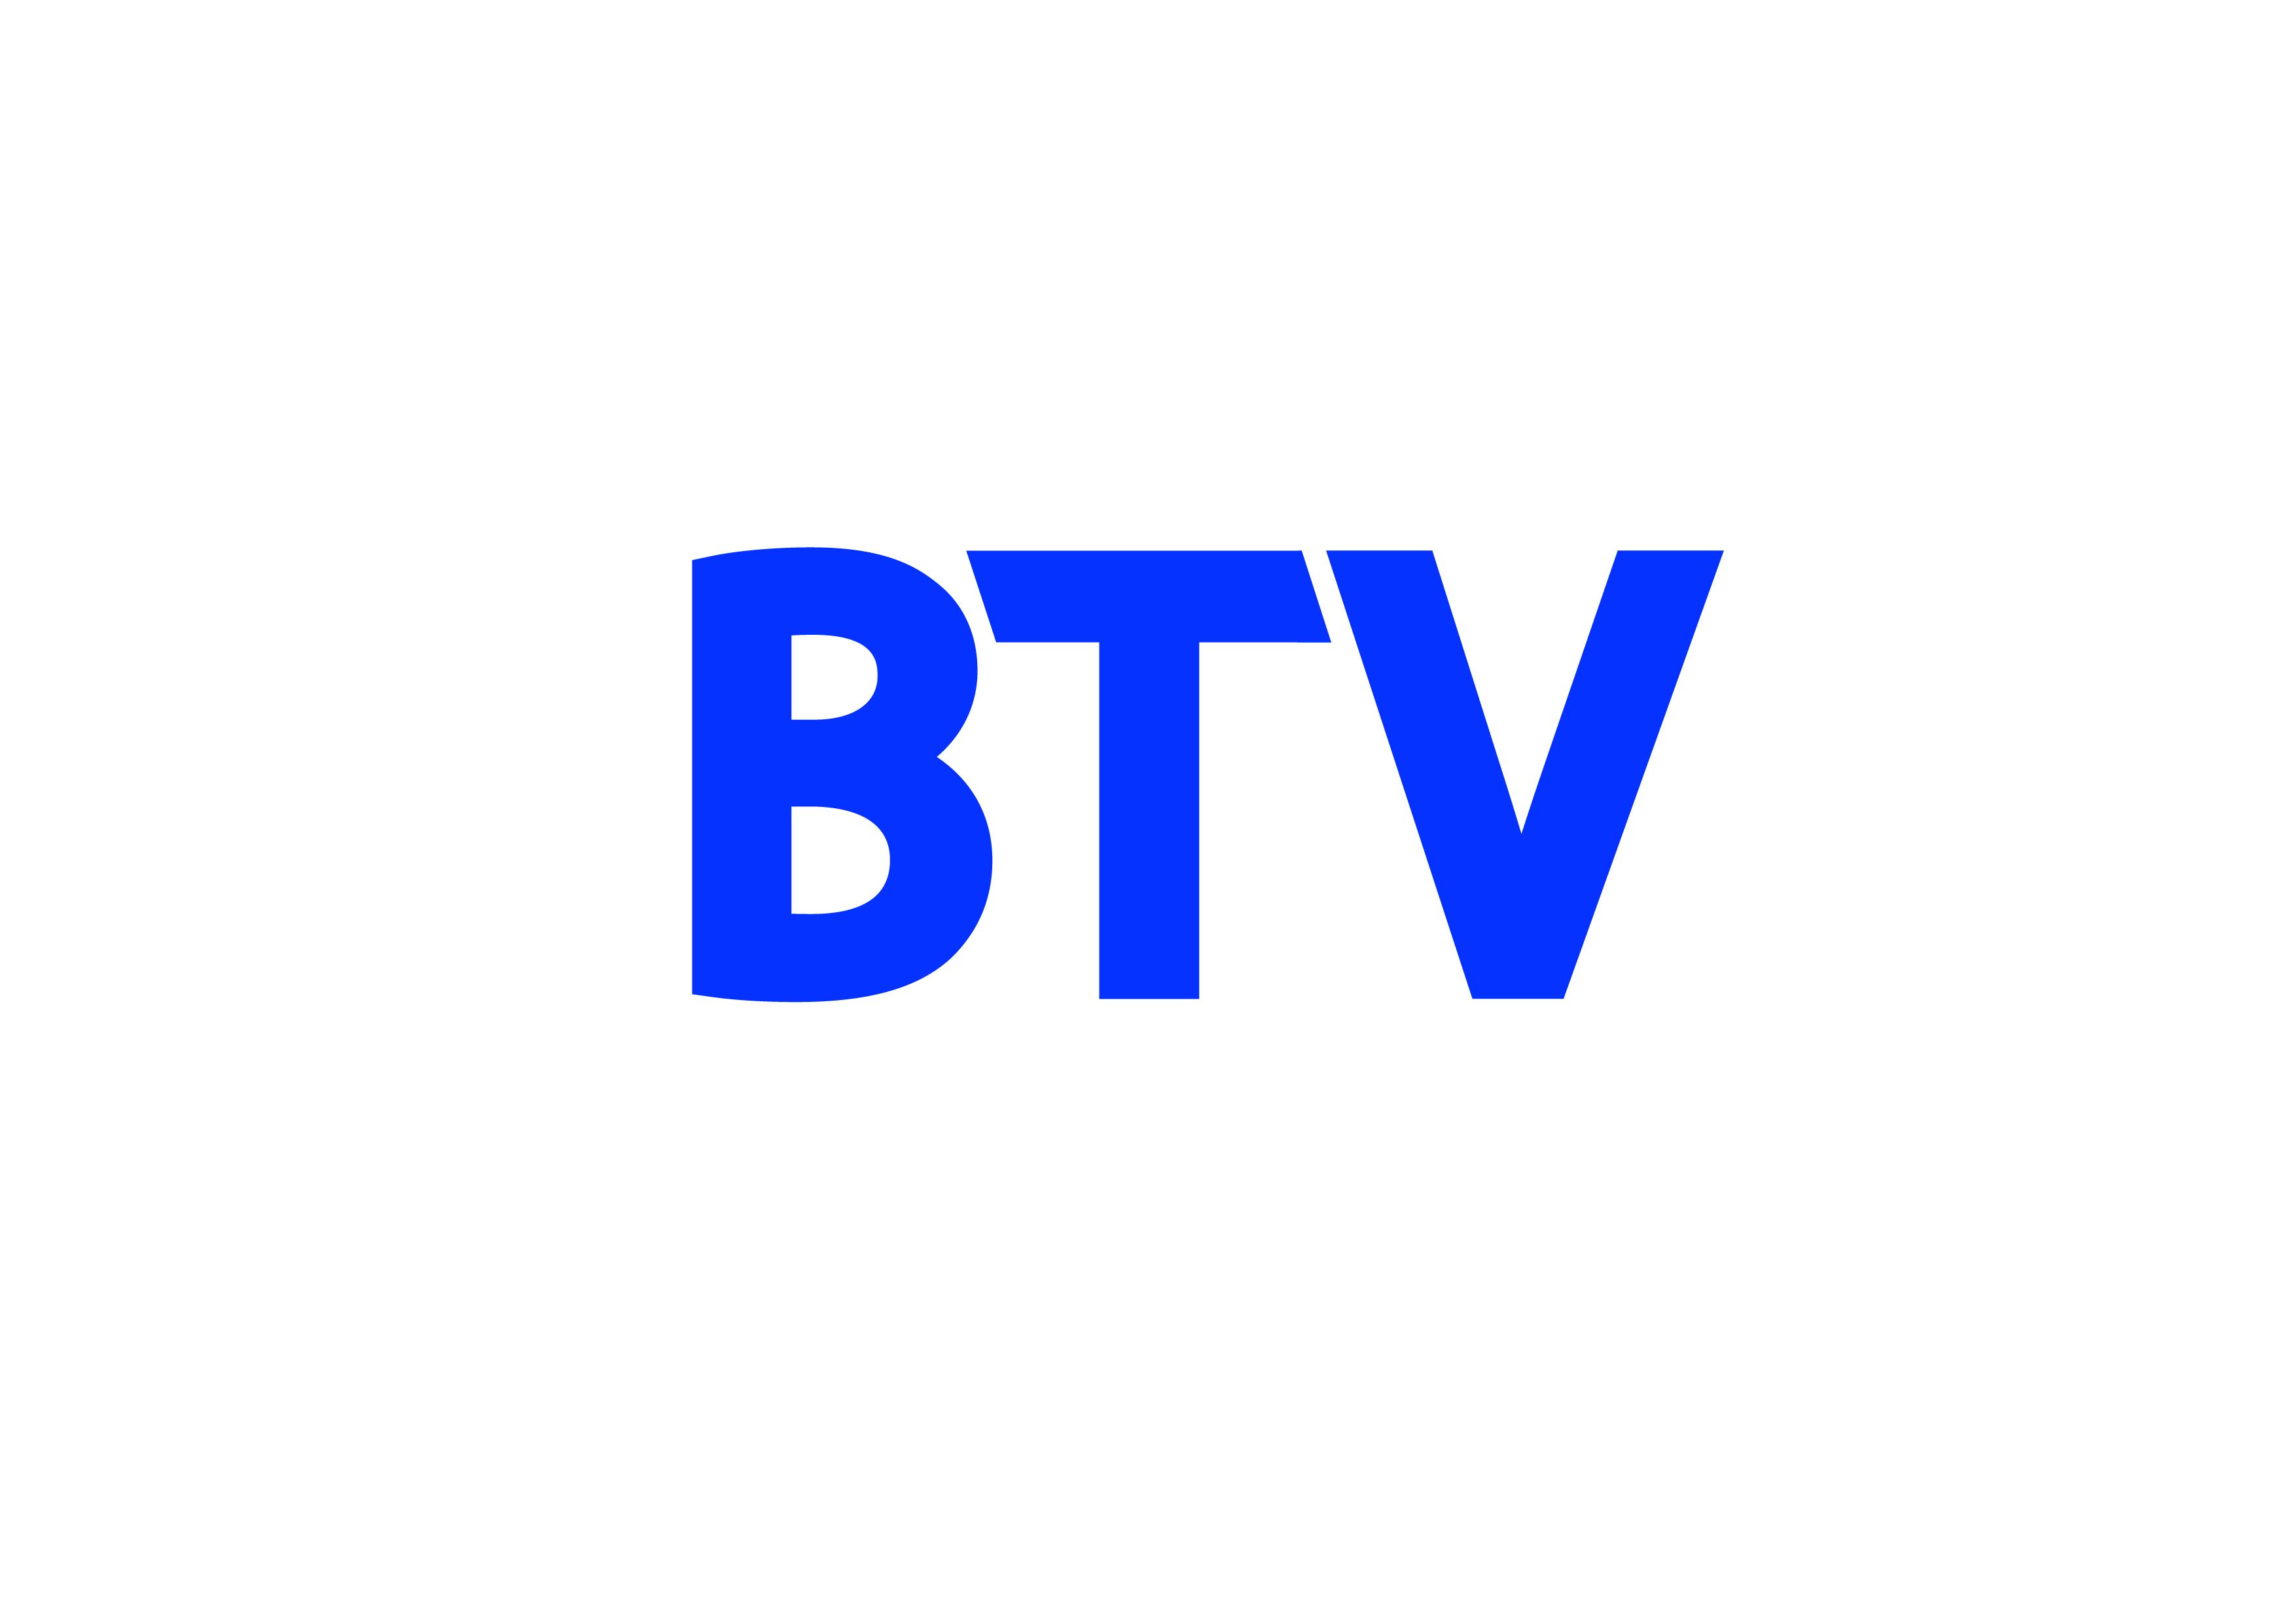 BTV (Lithuania) - Wikipedia